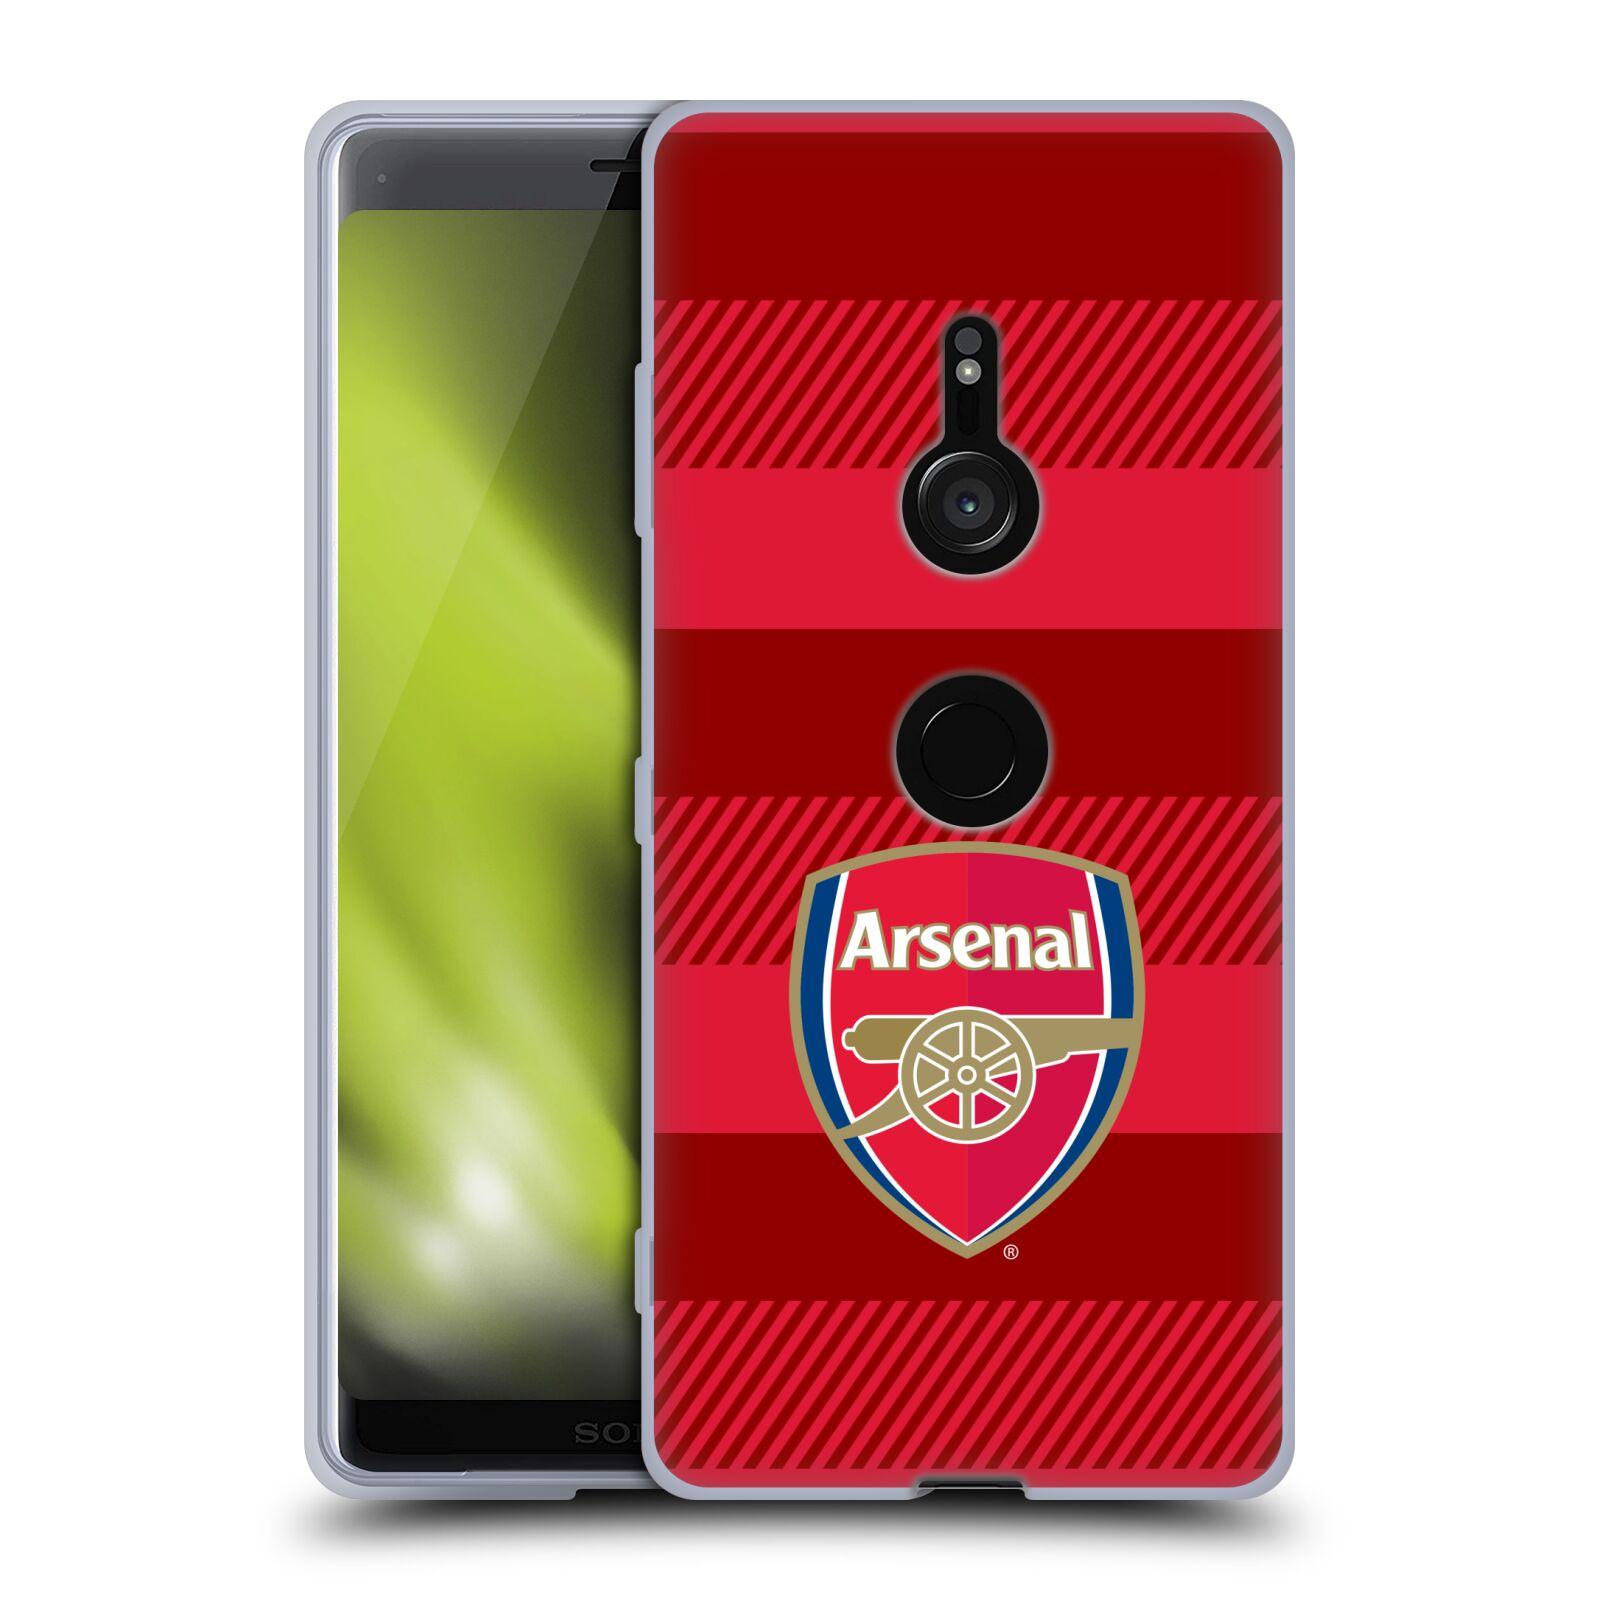 Silikonové pouzdro na mobil Sony Xperia XZ3 - Head Case - Arsenal FC - Logo s pruhy